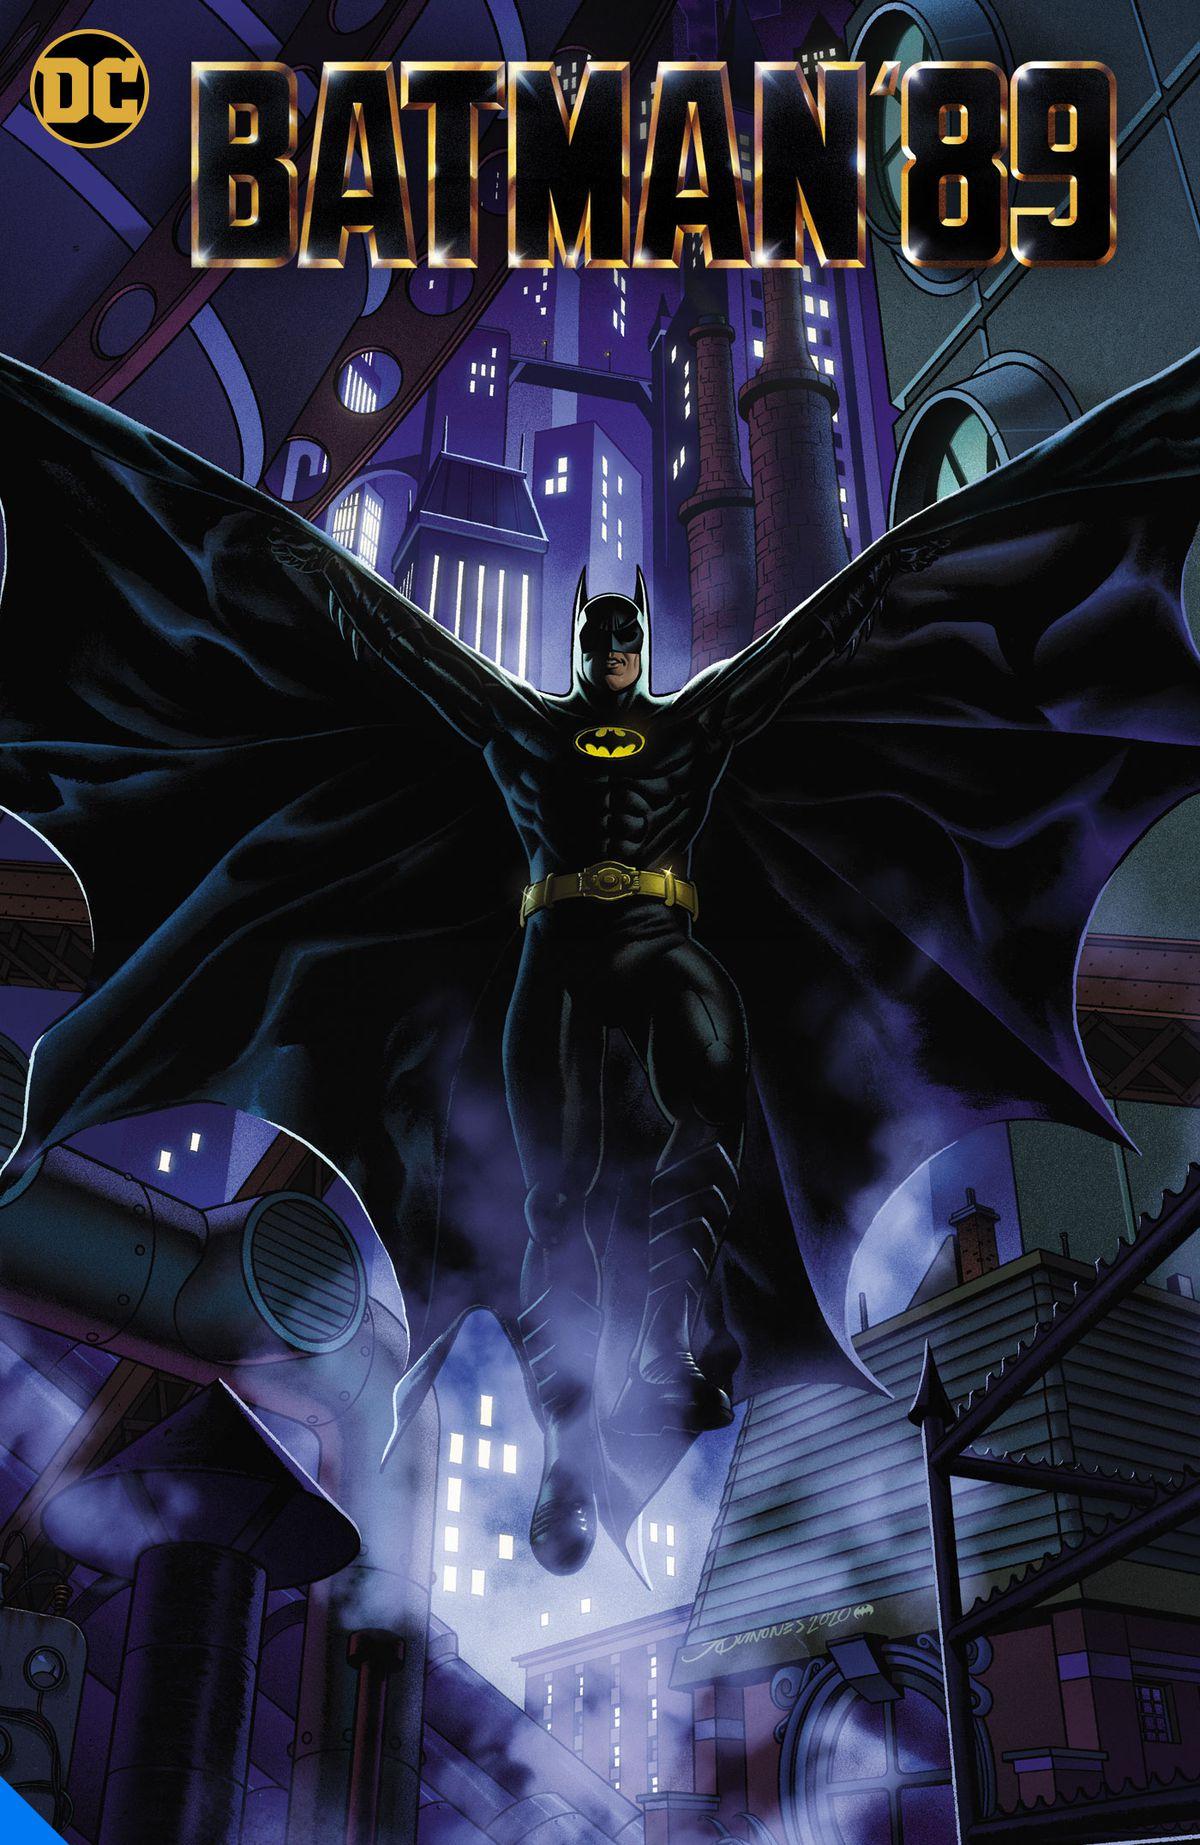 Batman 89 comics cover of Keaton's batman swooping down in front of skyscrapers from DC Comics